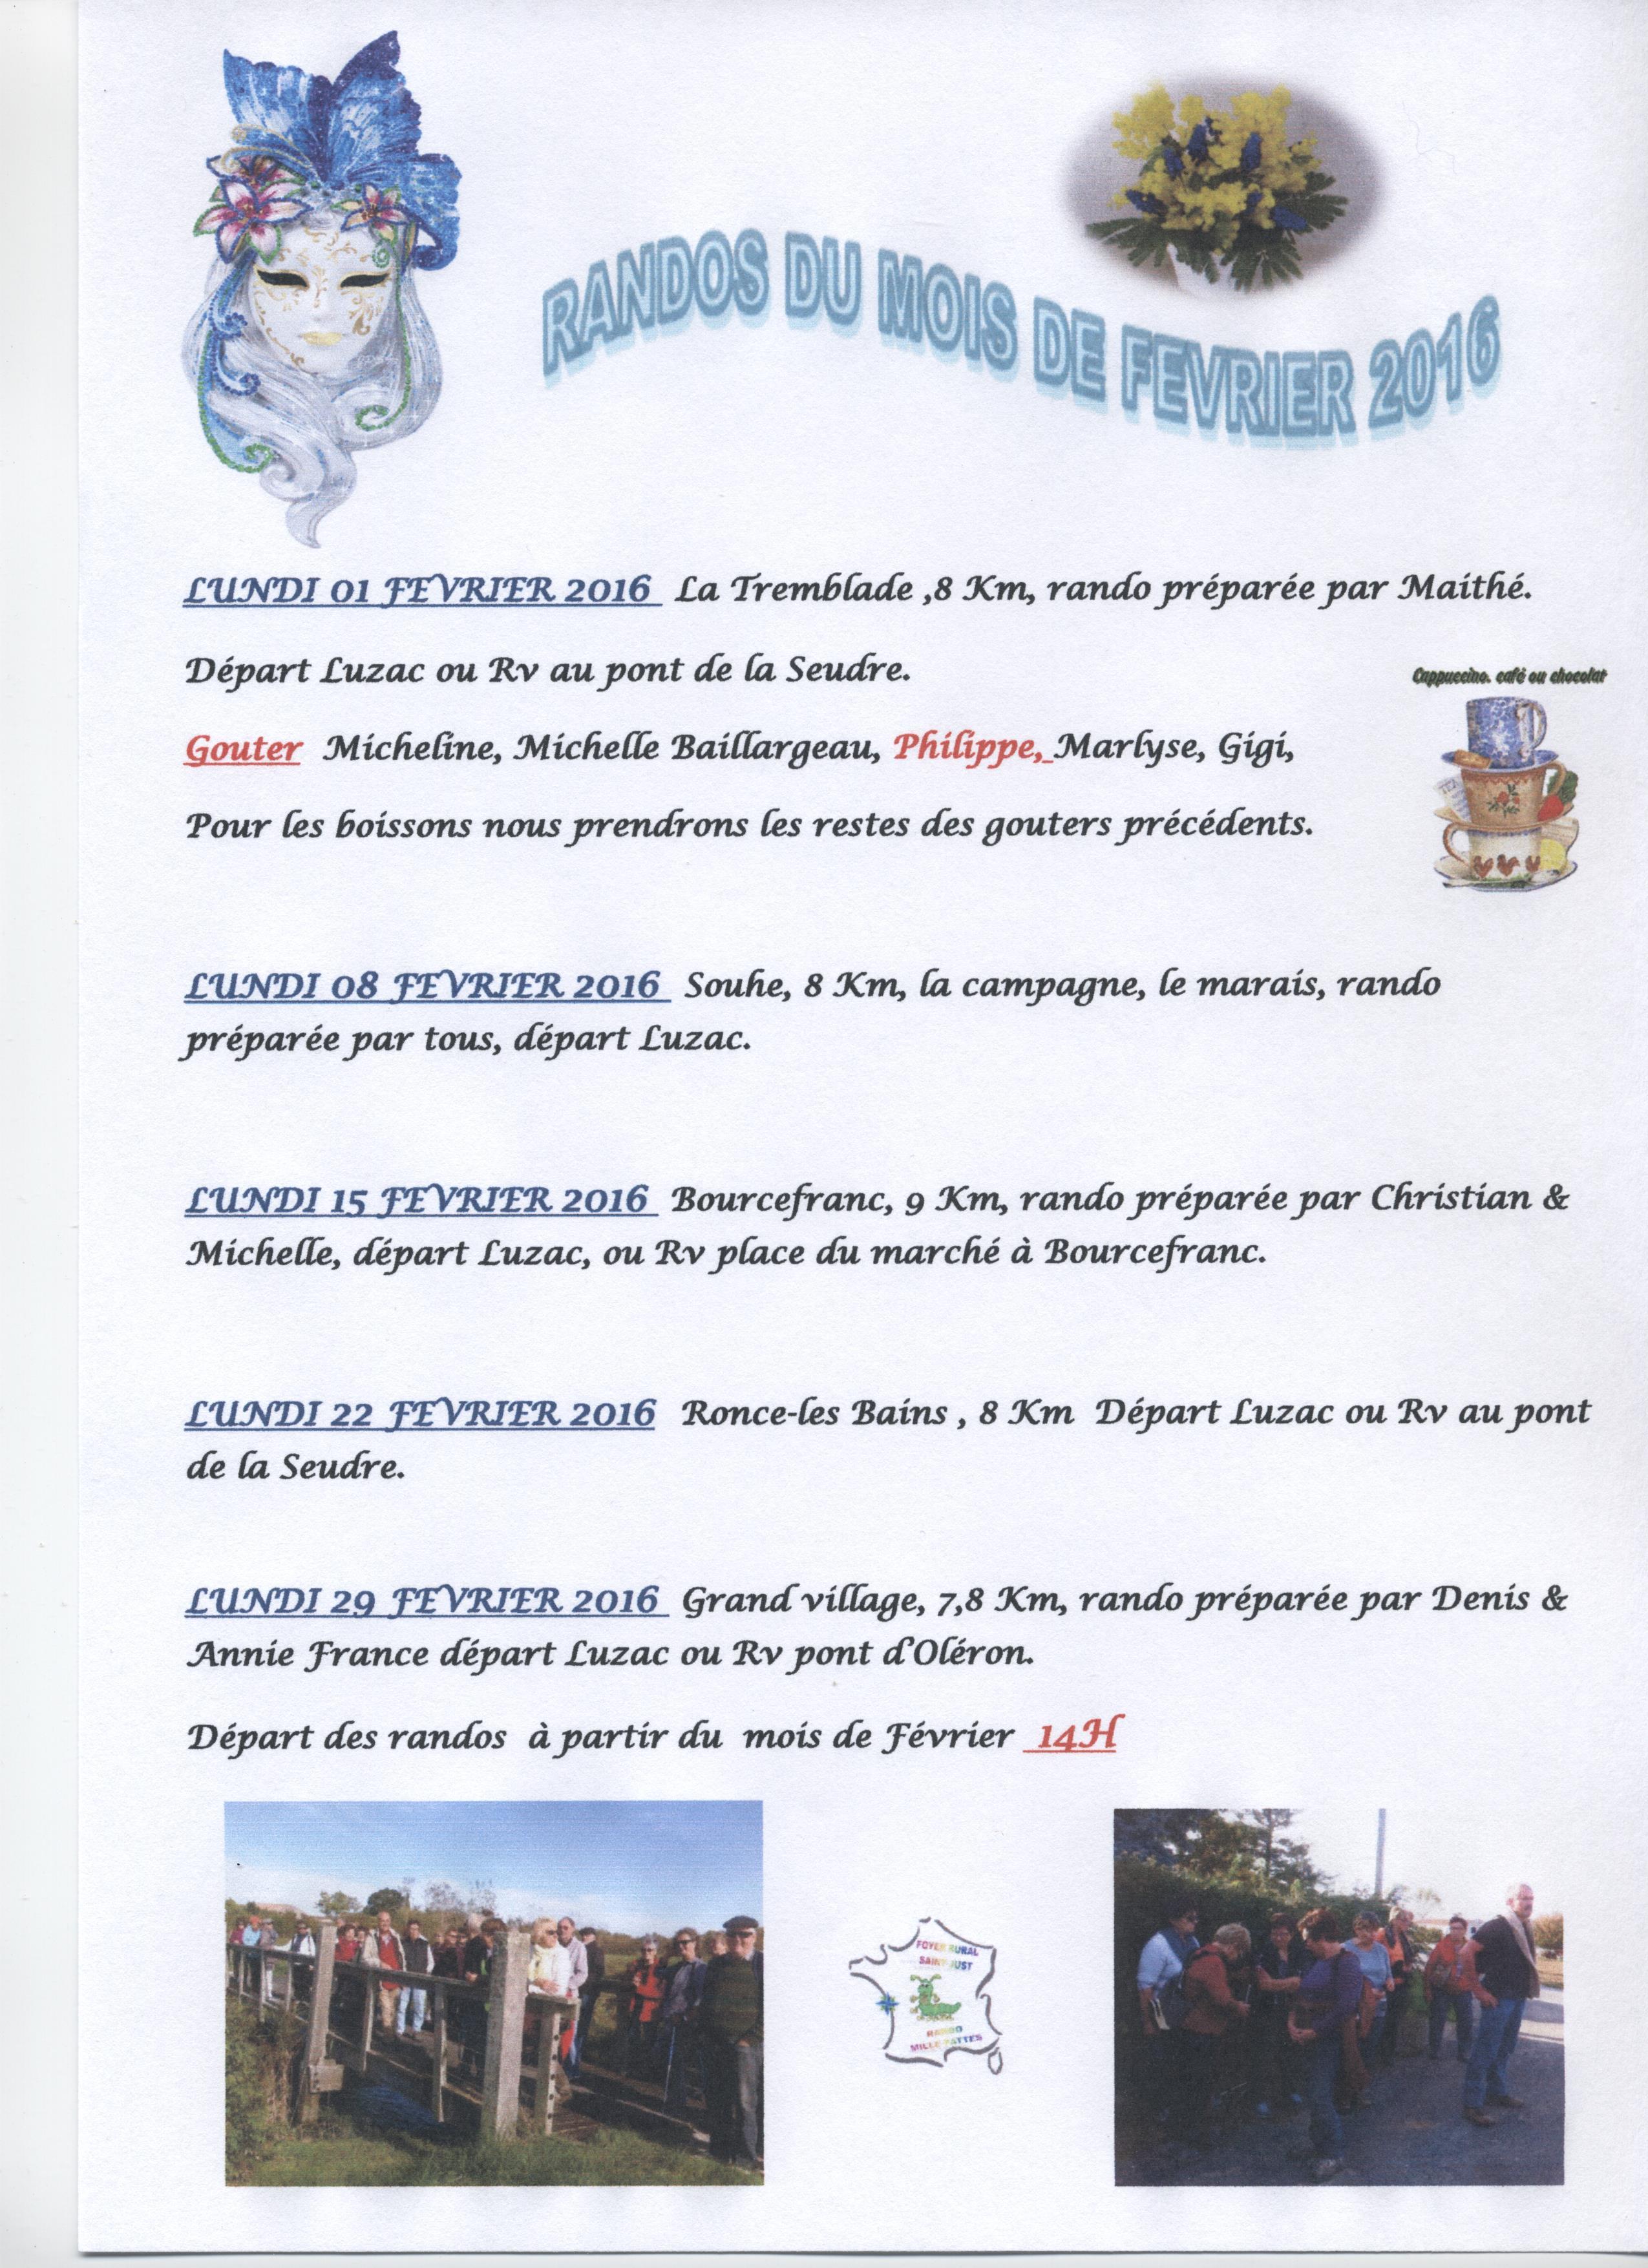 PROGRAMME DES RANDOS DE FEVRIER 2016